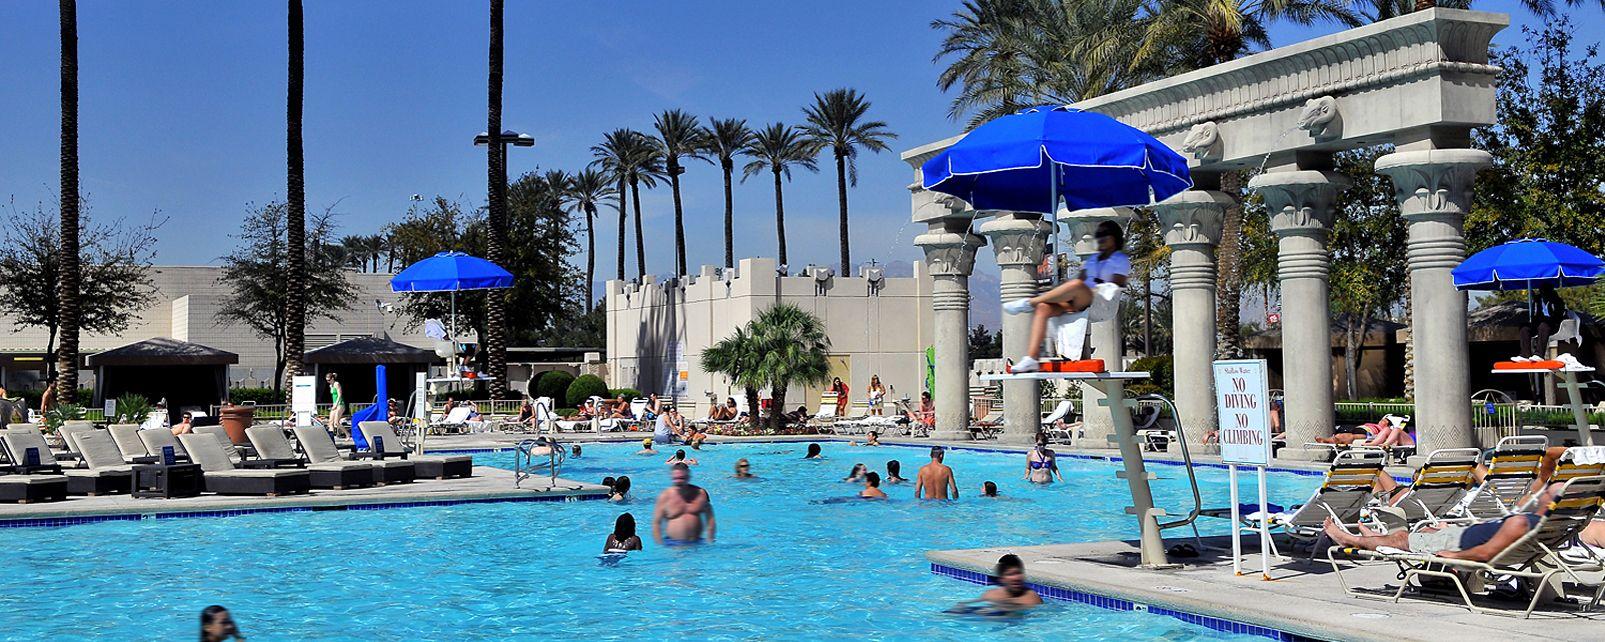 Hotel  Ef Bf Bd Las Vegas Pas Cher